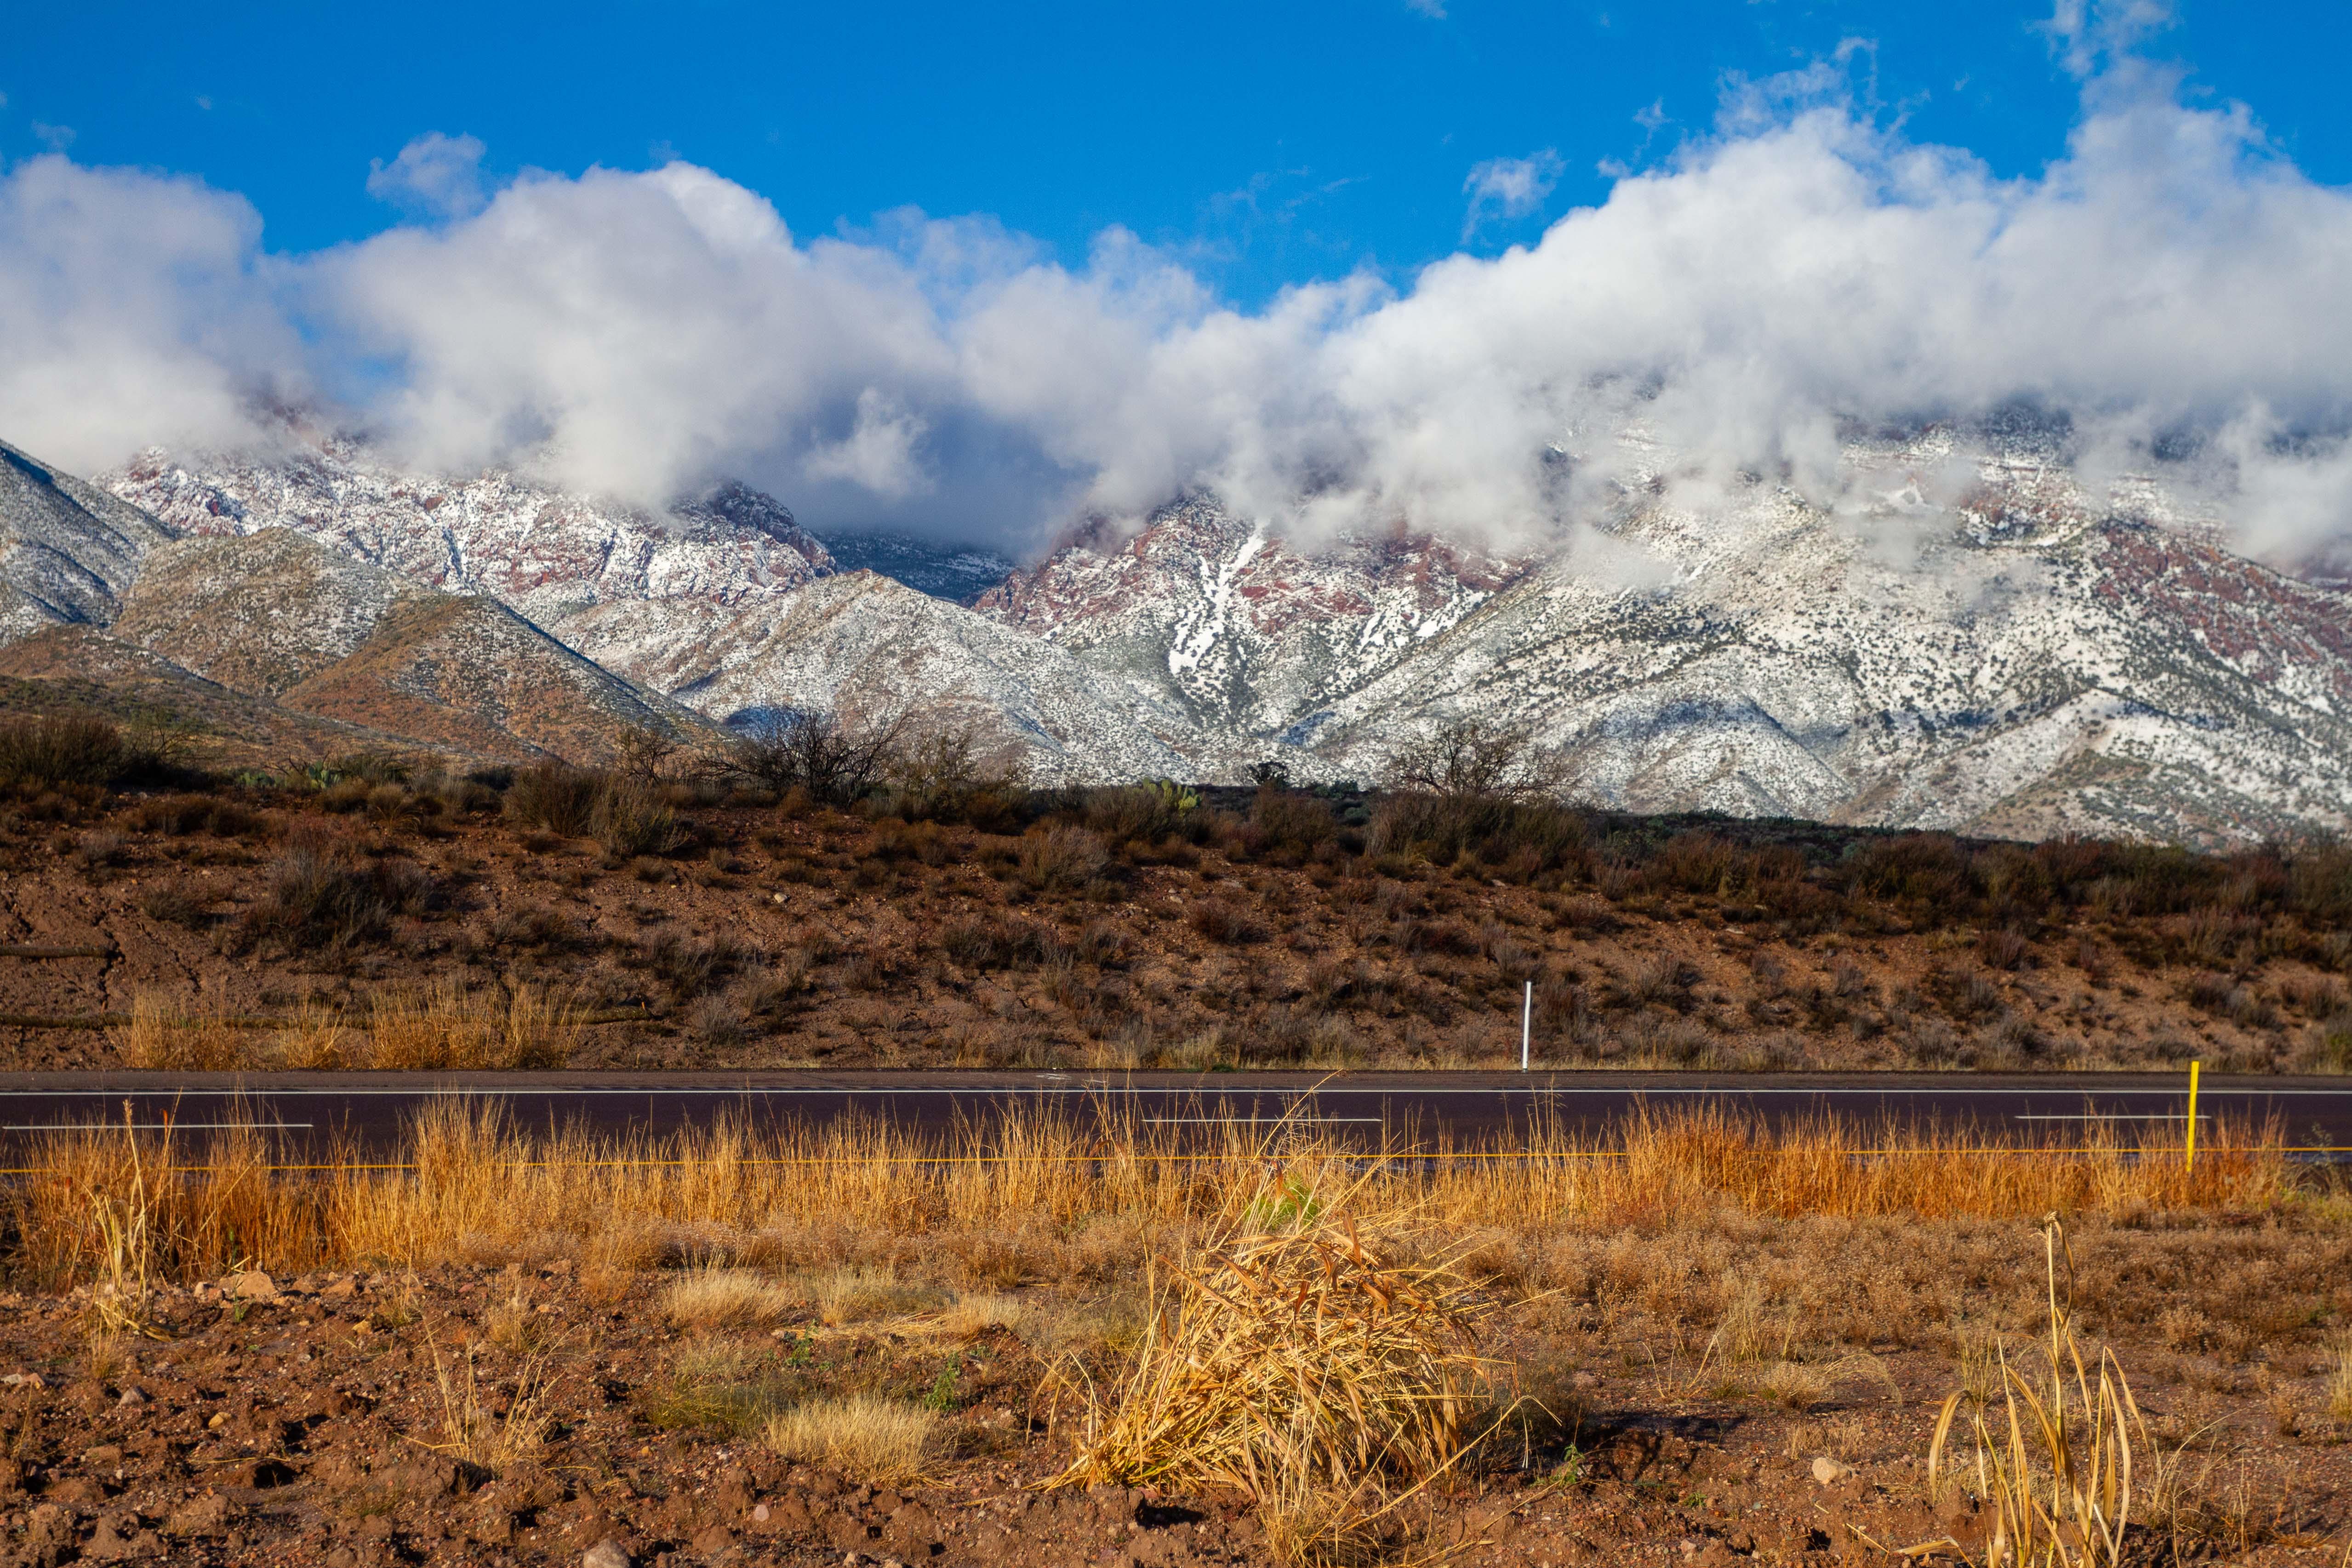 Arizona Highway 87 Snow Covered Mountains